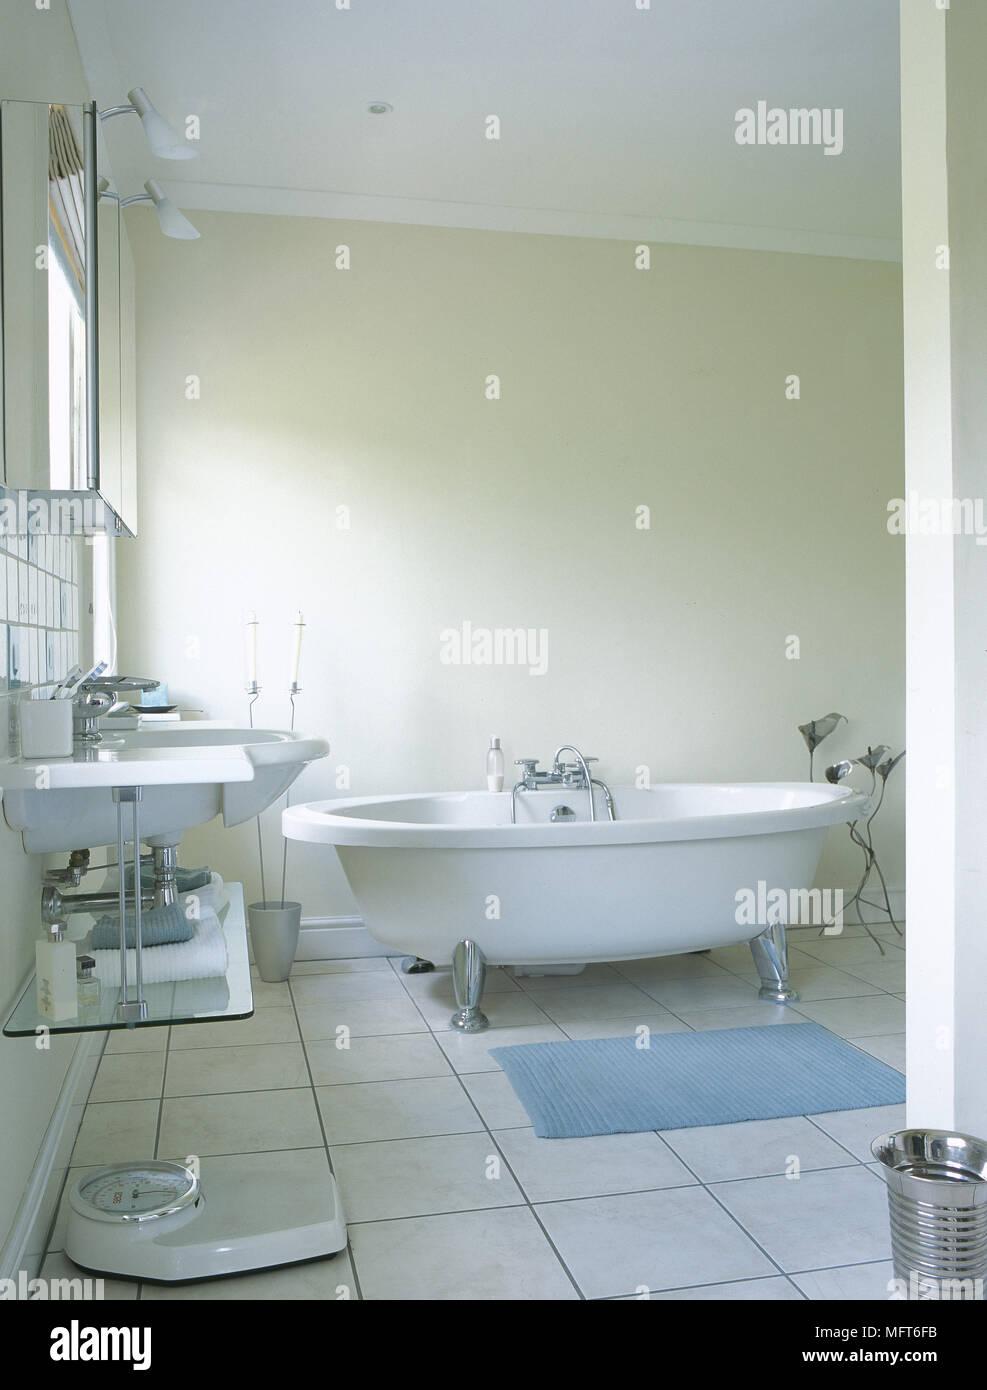 Modern bathroom with freestanding bathtub, sink with glass shelf ...